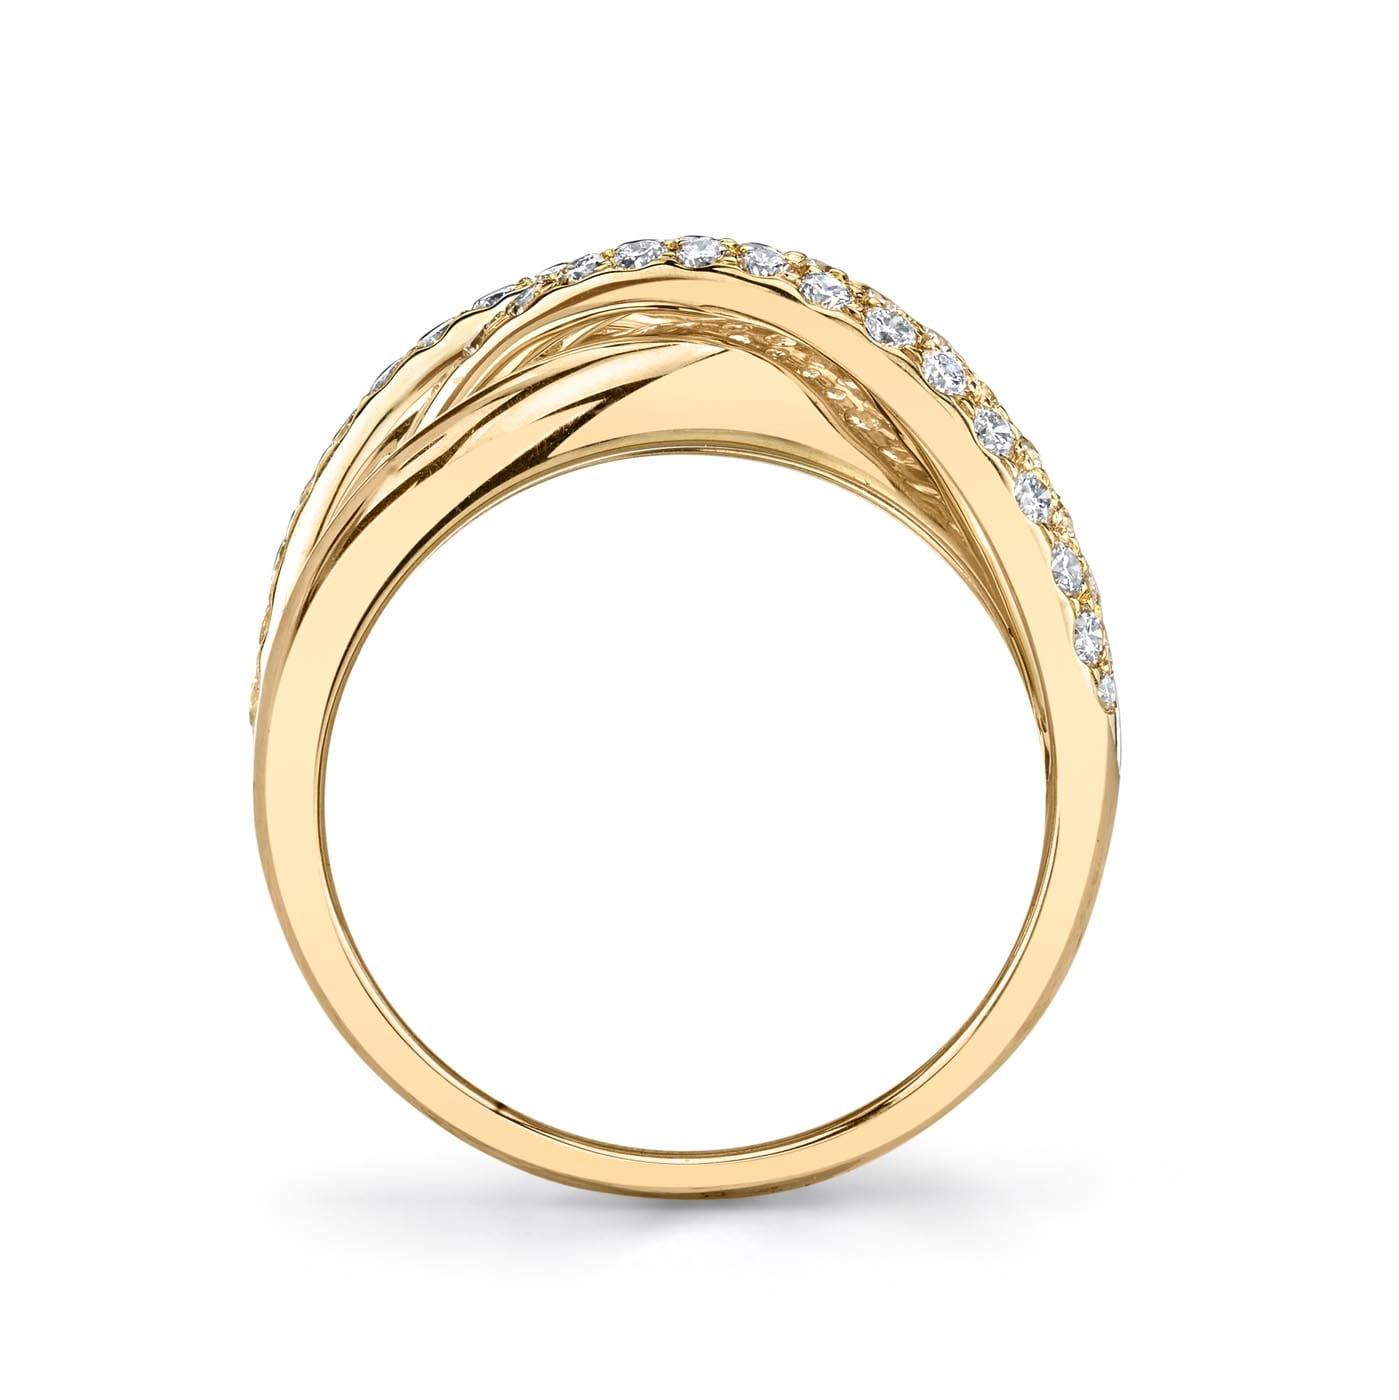 183102c8d684 Diamond Ring - Fashion Band Style #: MARS-26857   Shop Engagement ...